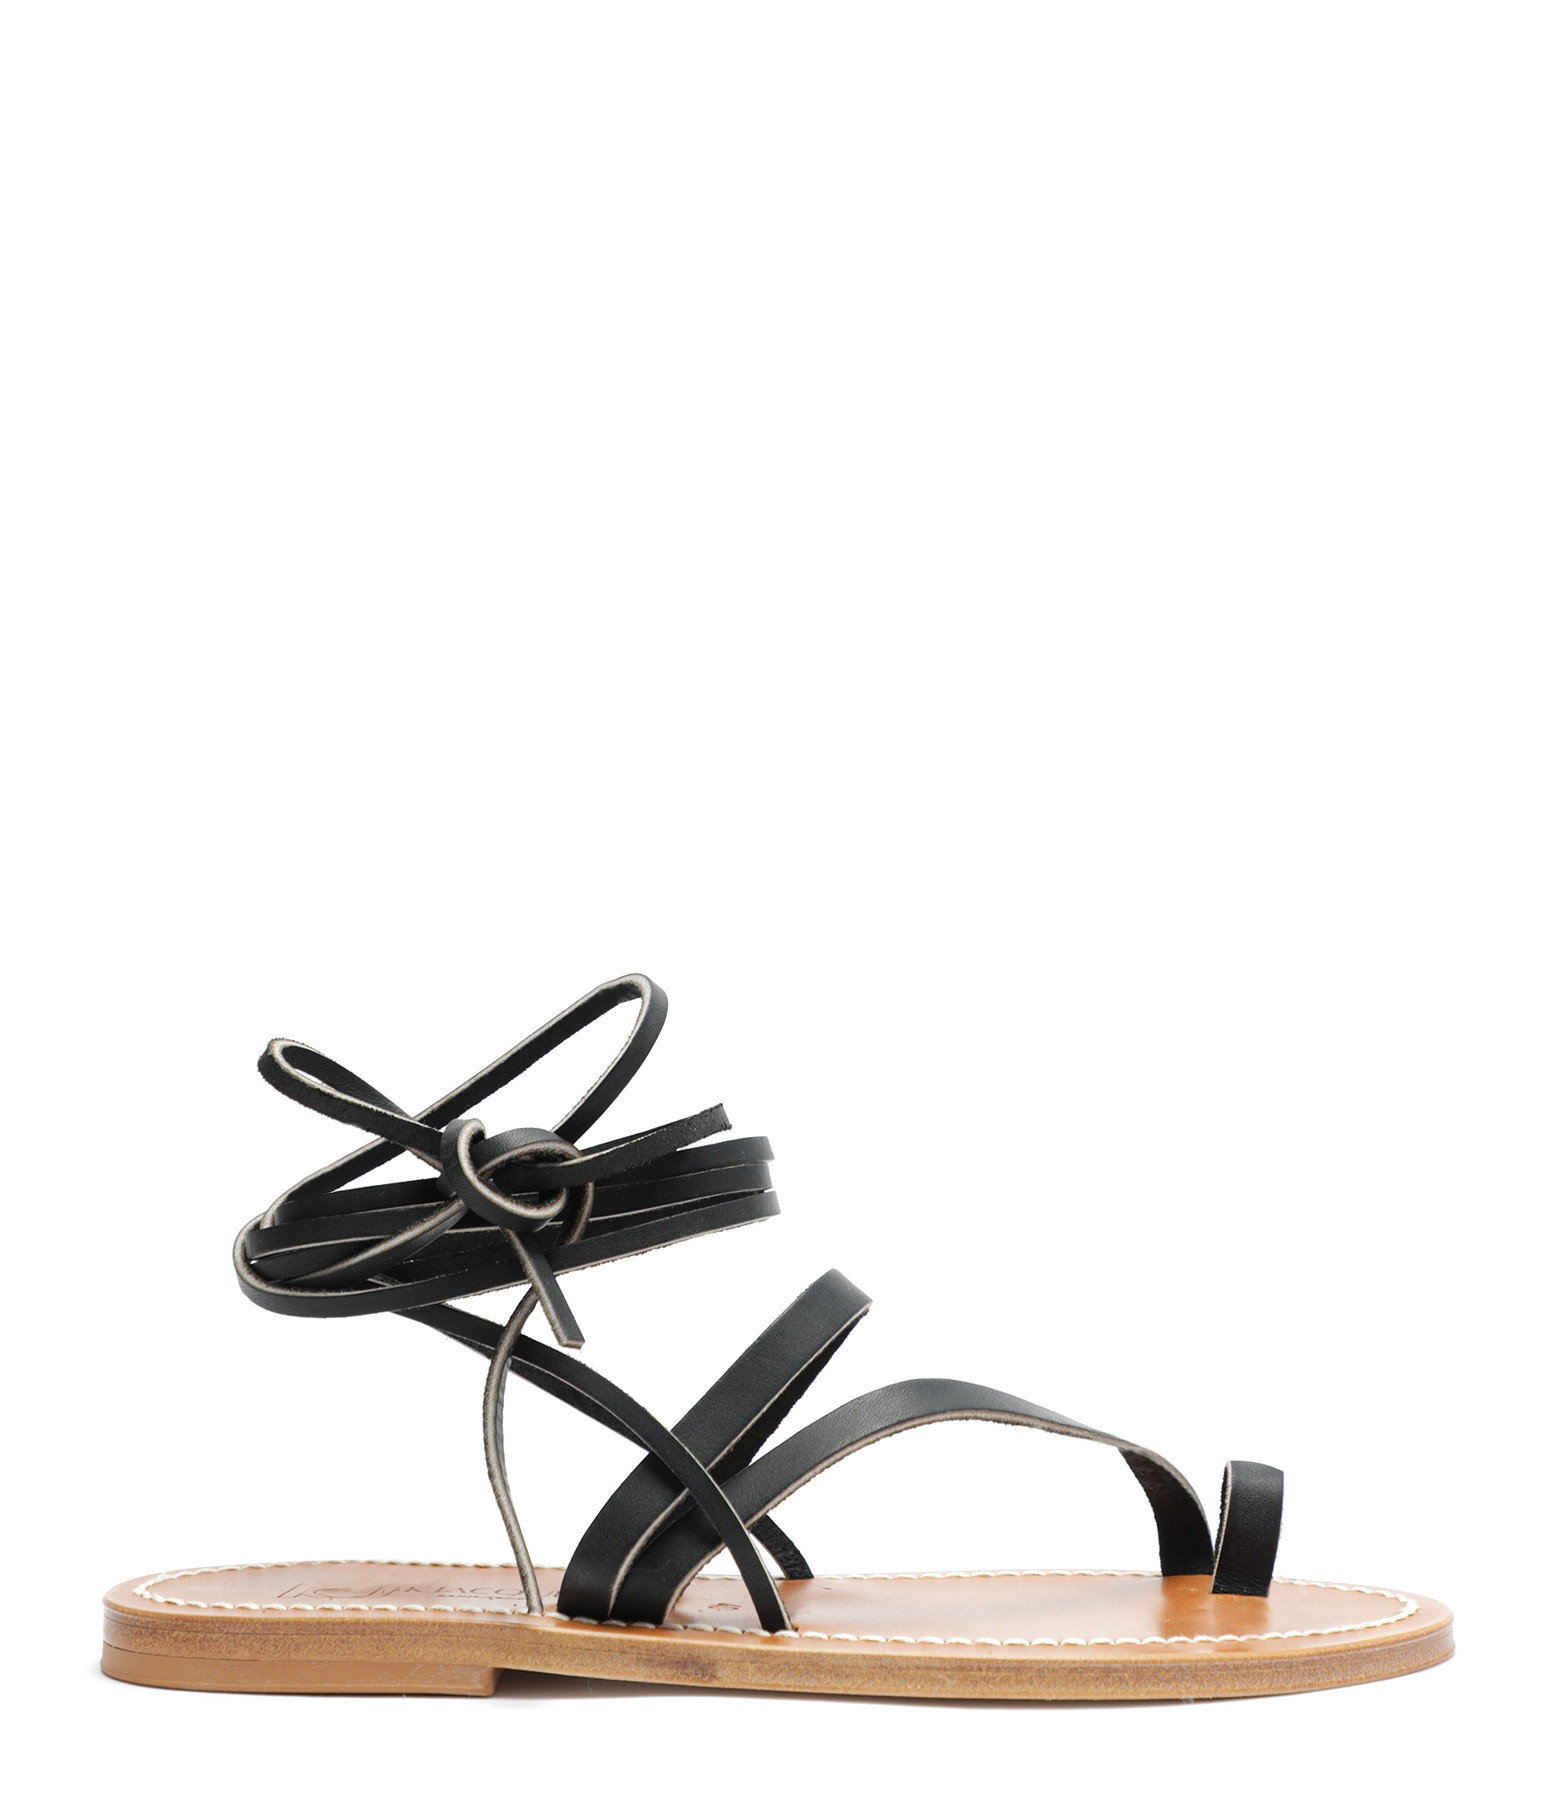 K.JACQUES - Sandales Ellada Cuir Pul Noir